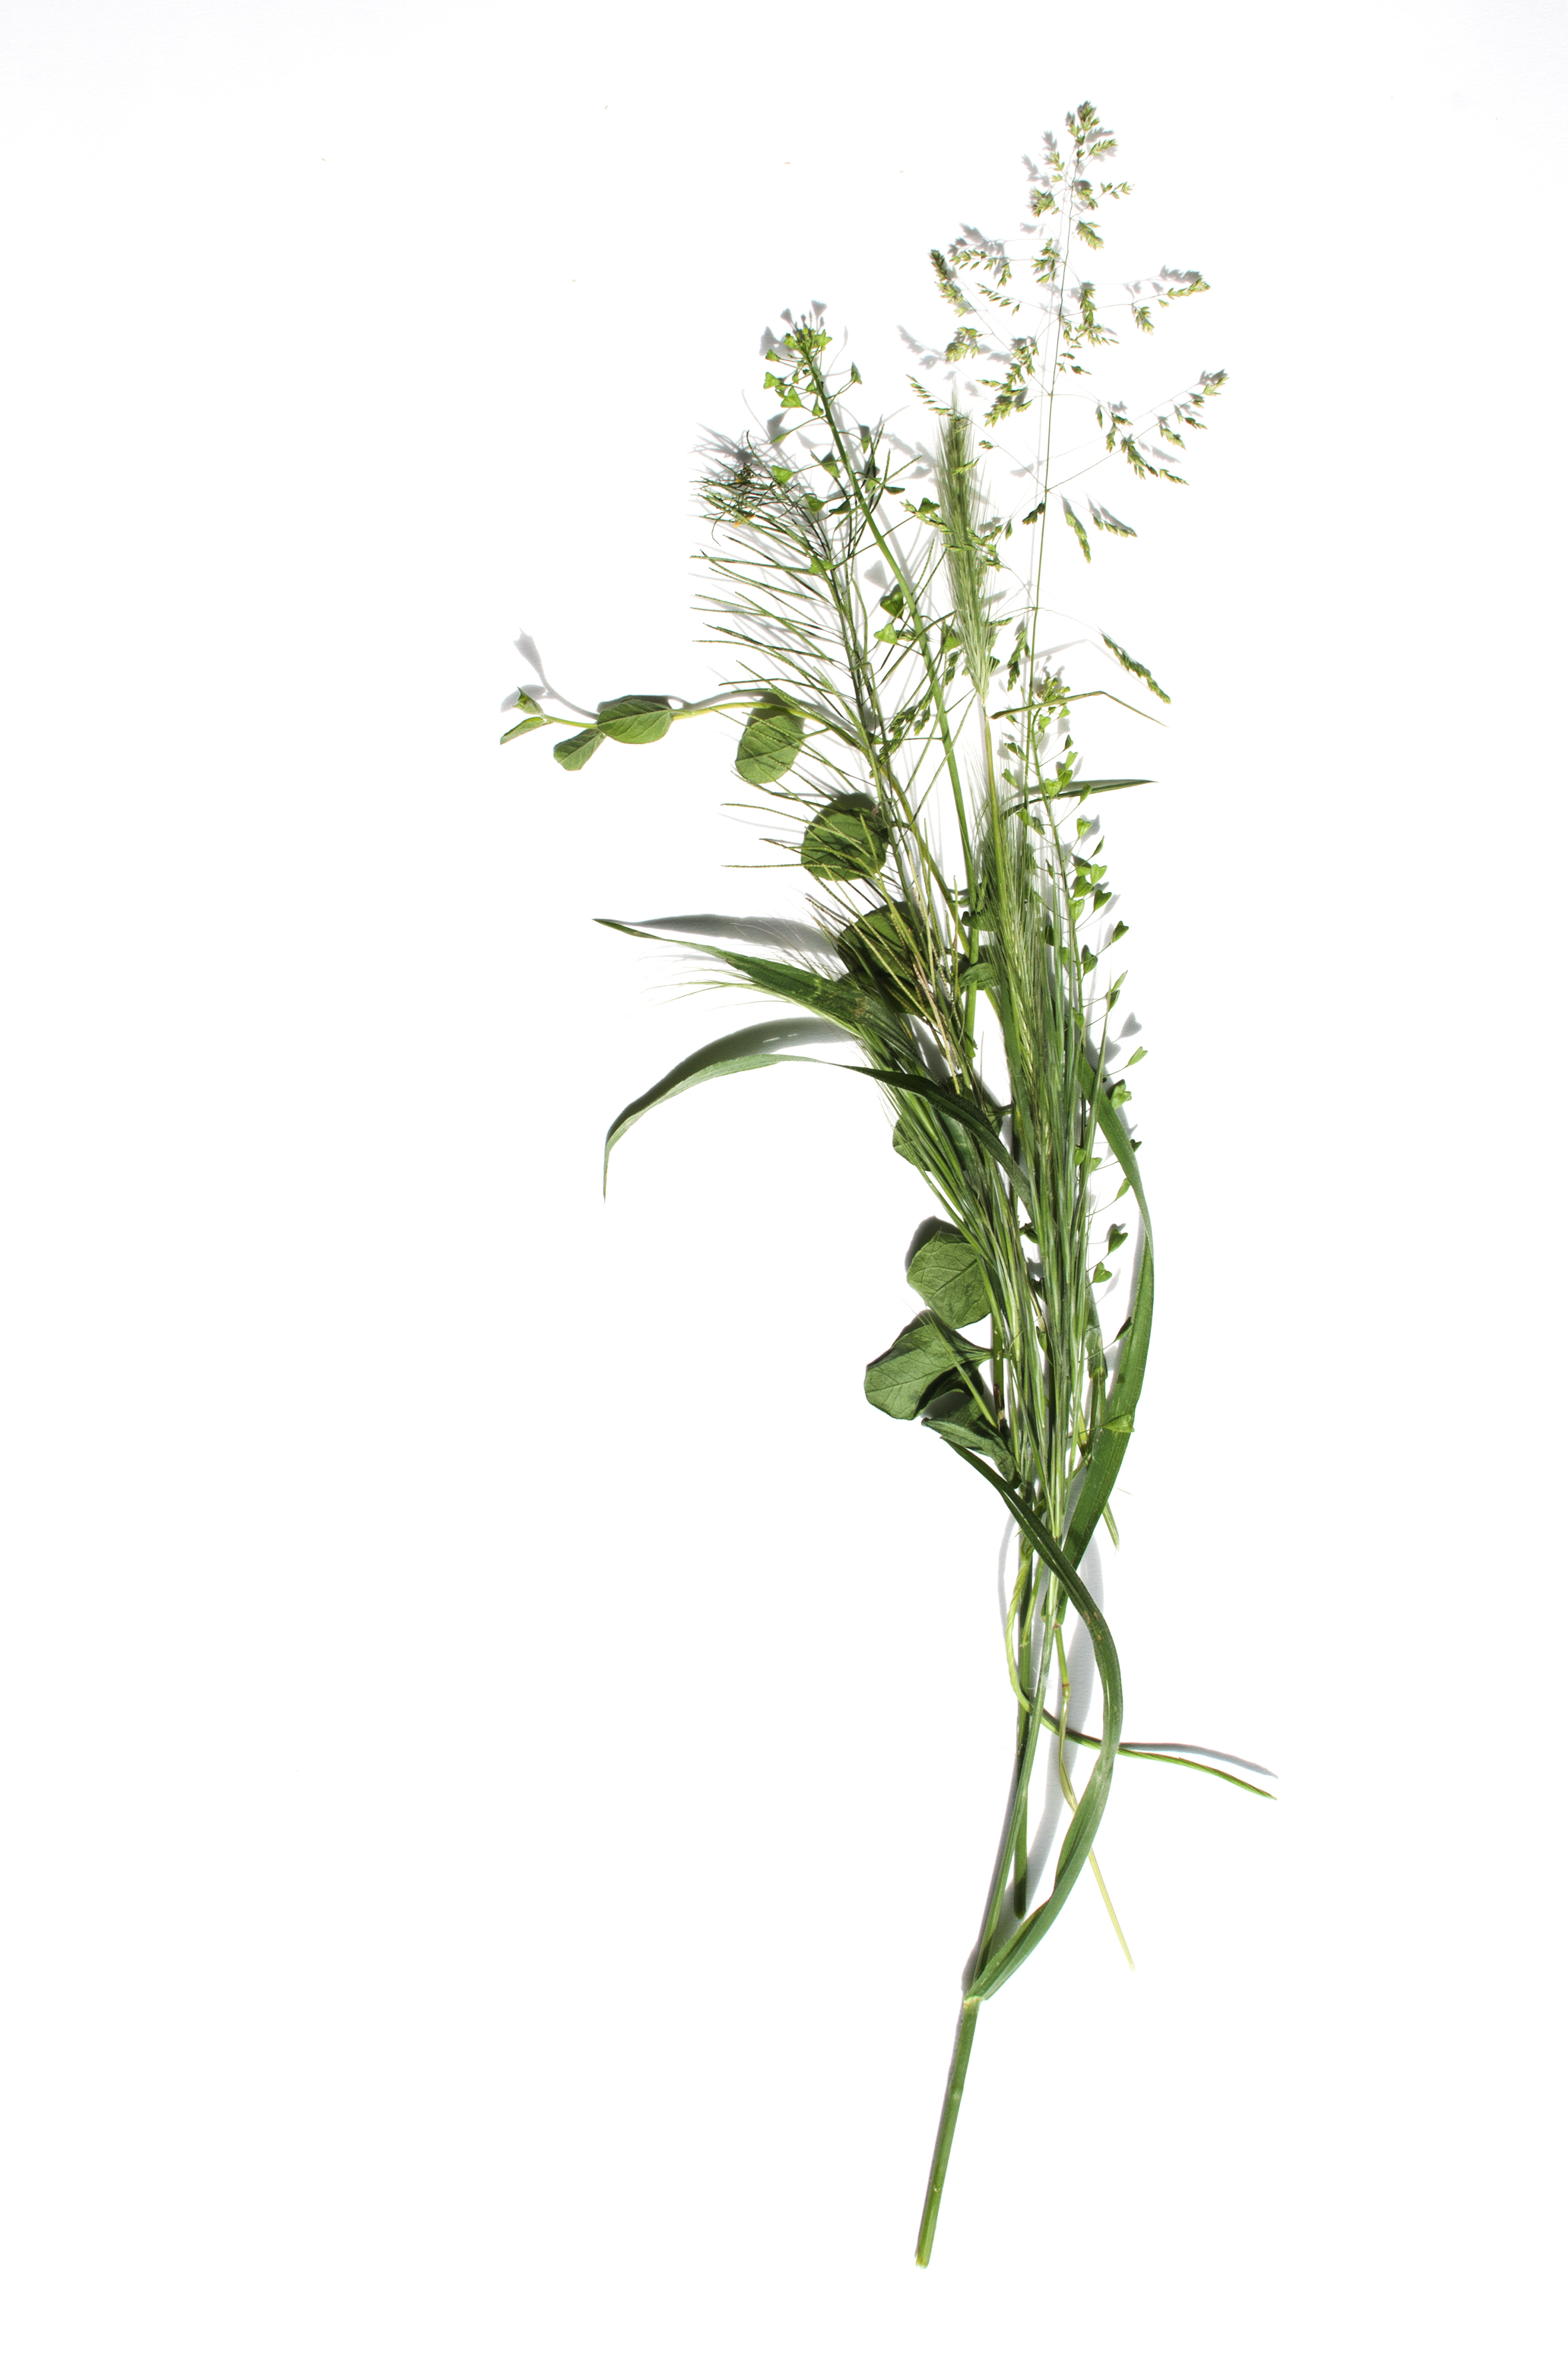 Foto: herbizidresistente Pflanze